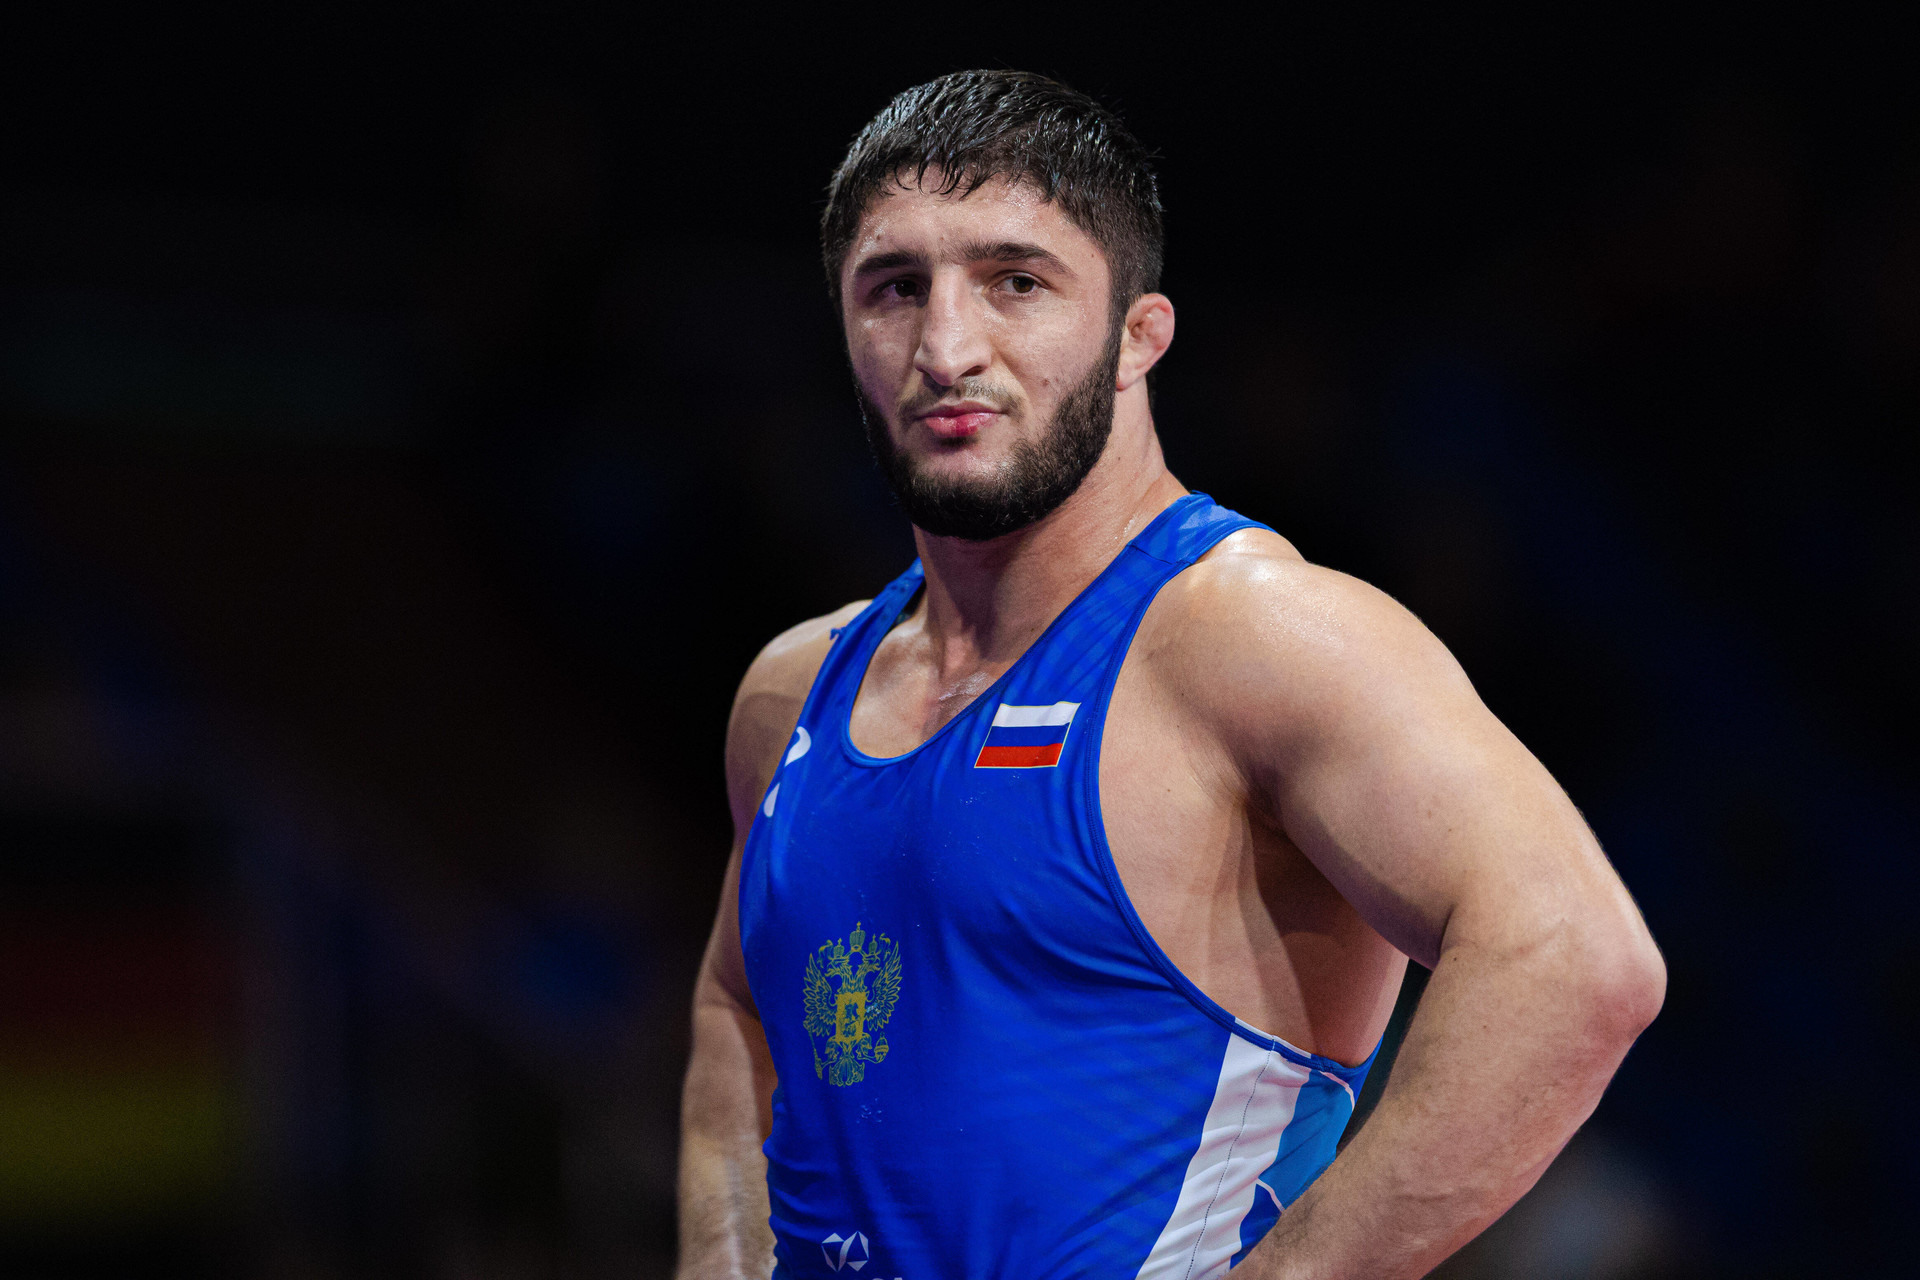 Abdulrashid Sadulaev